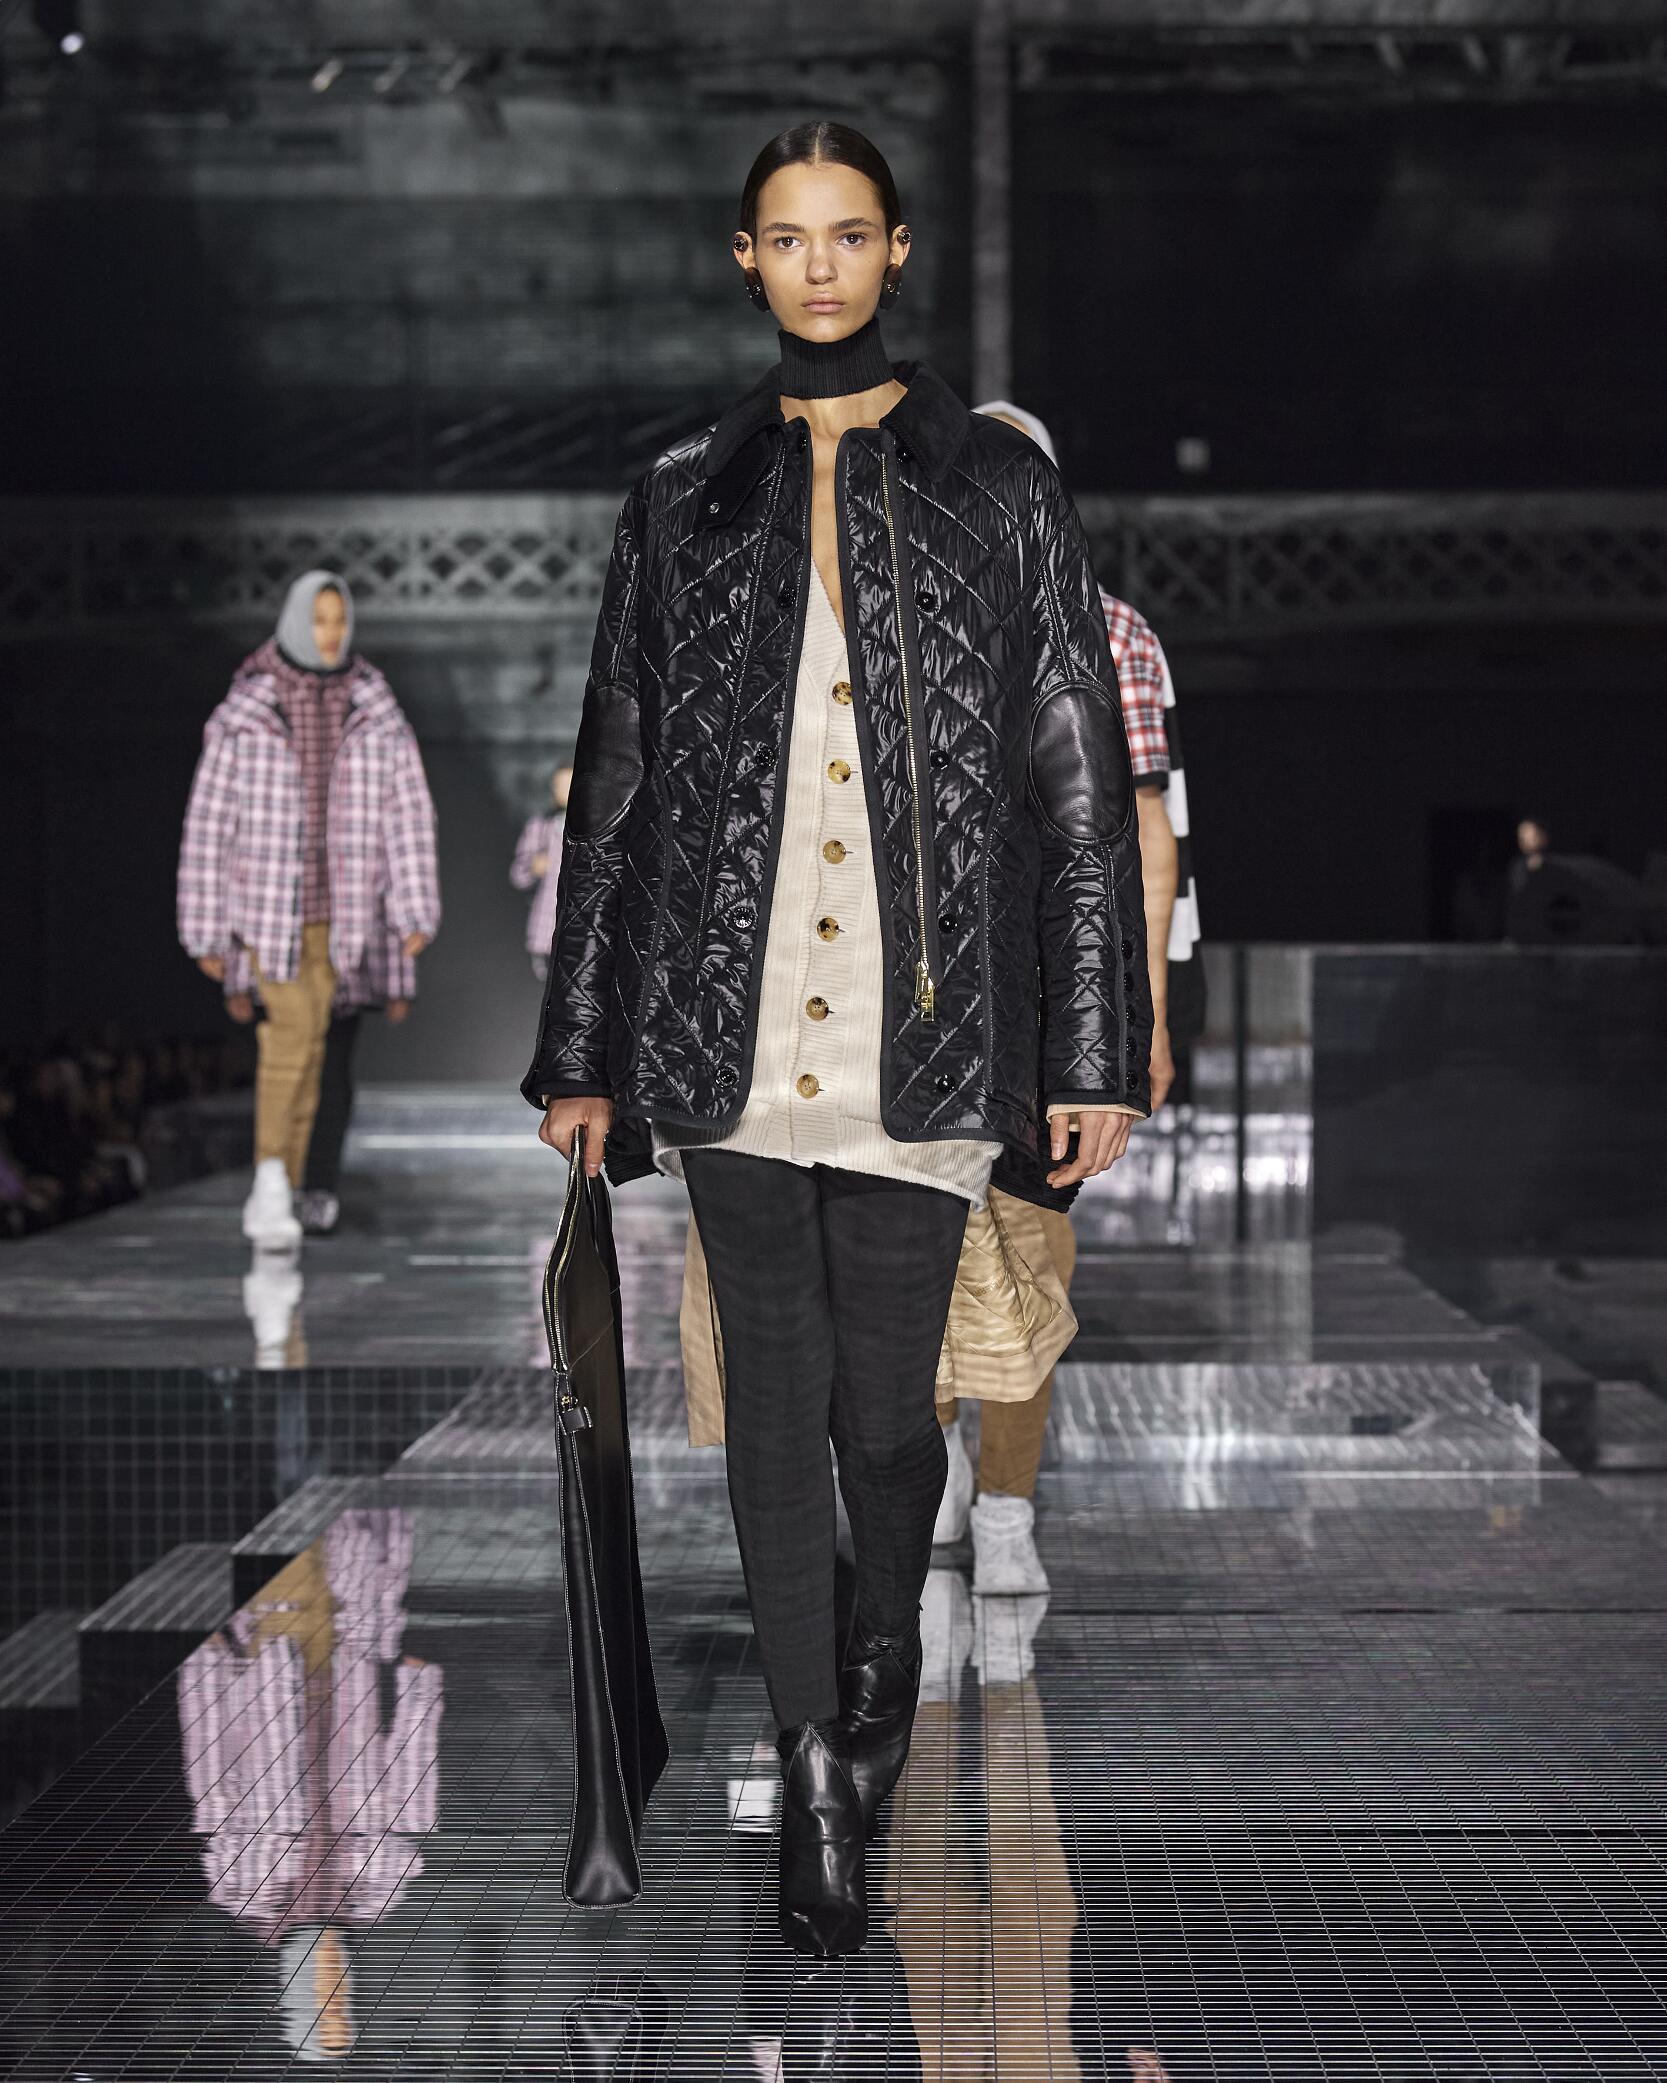 FW 2020 Burberry Show London Fashion Week